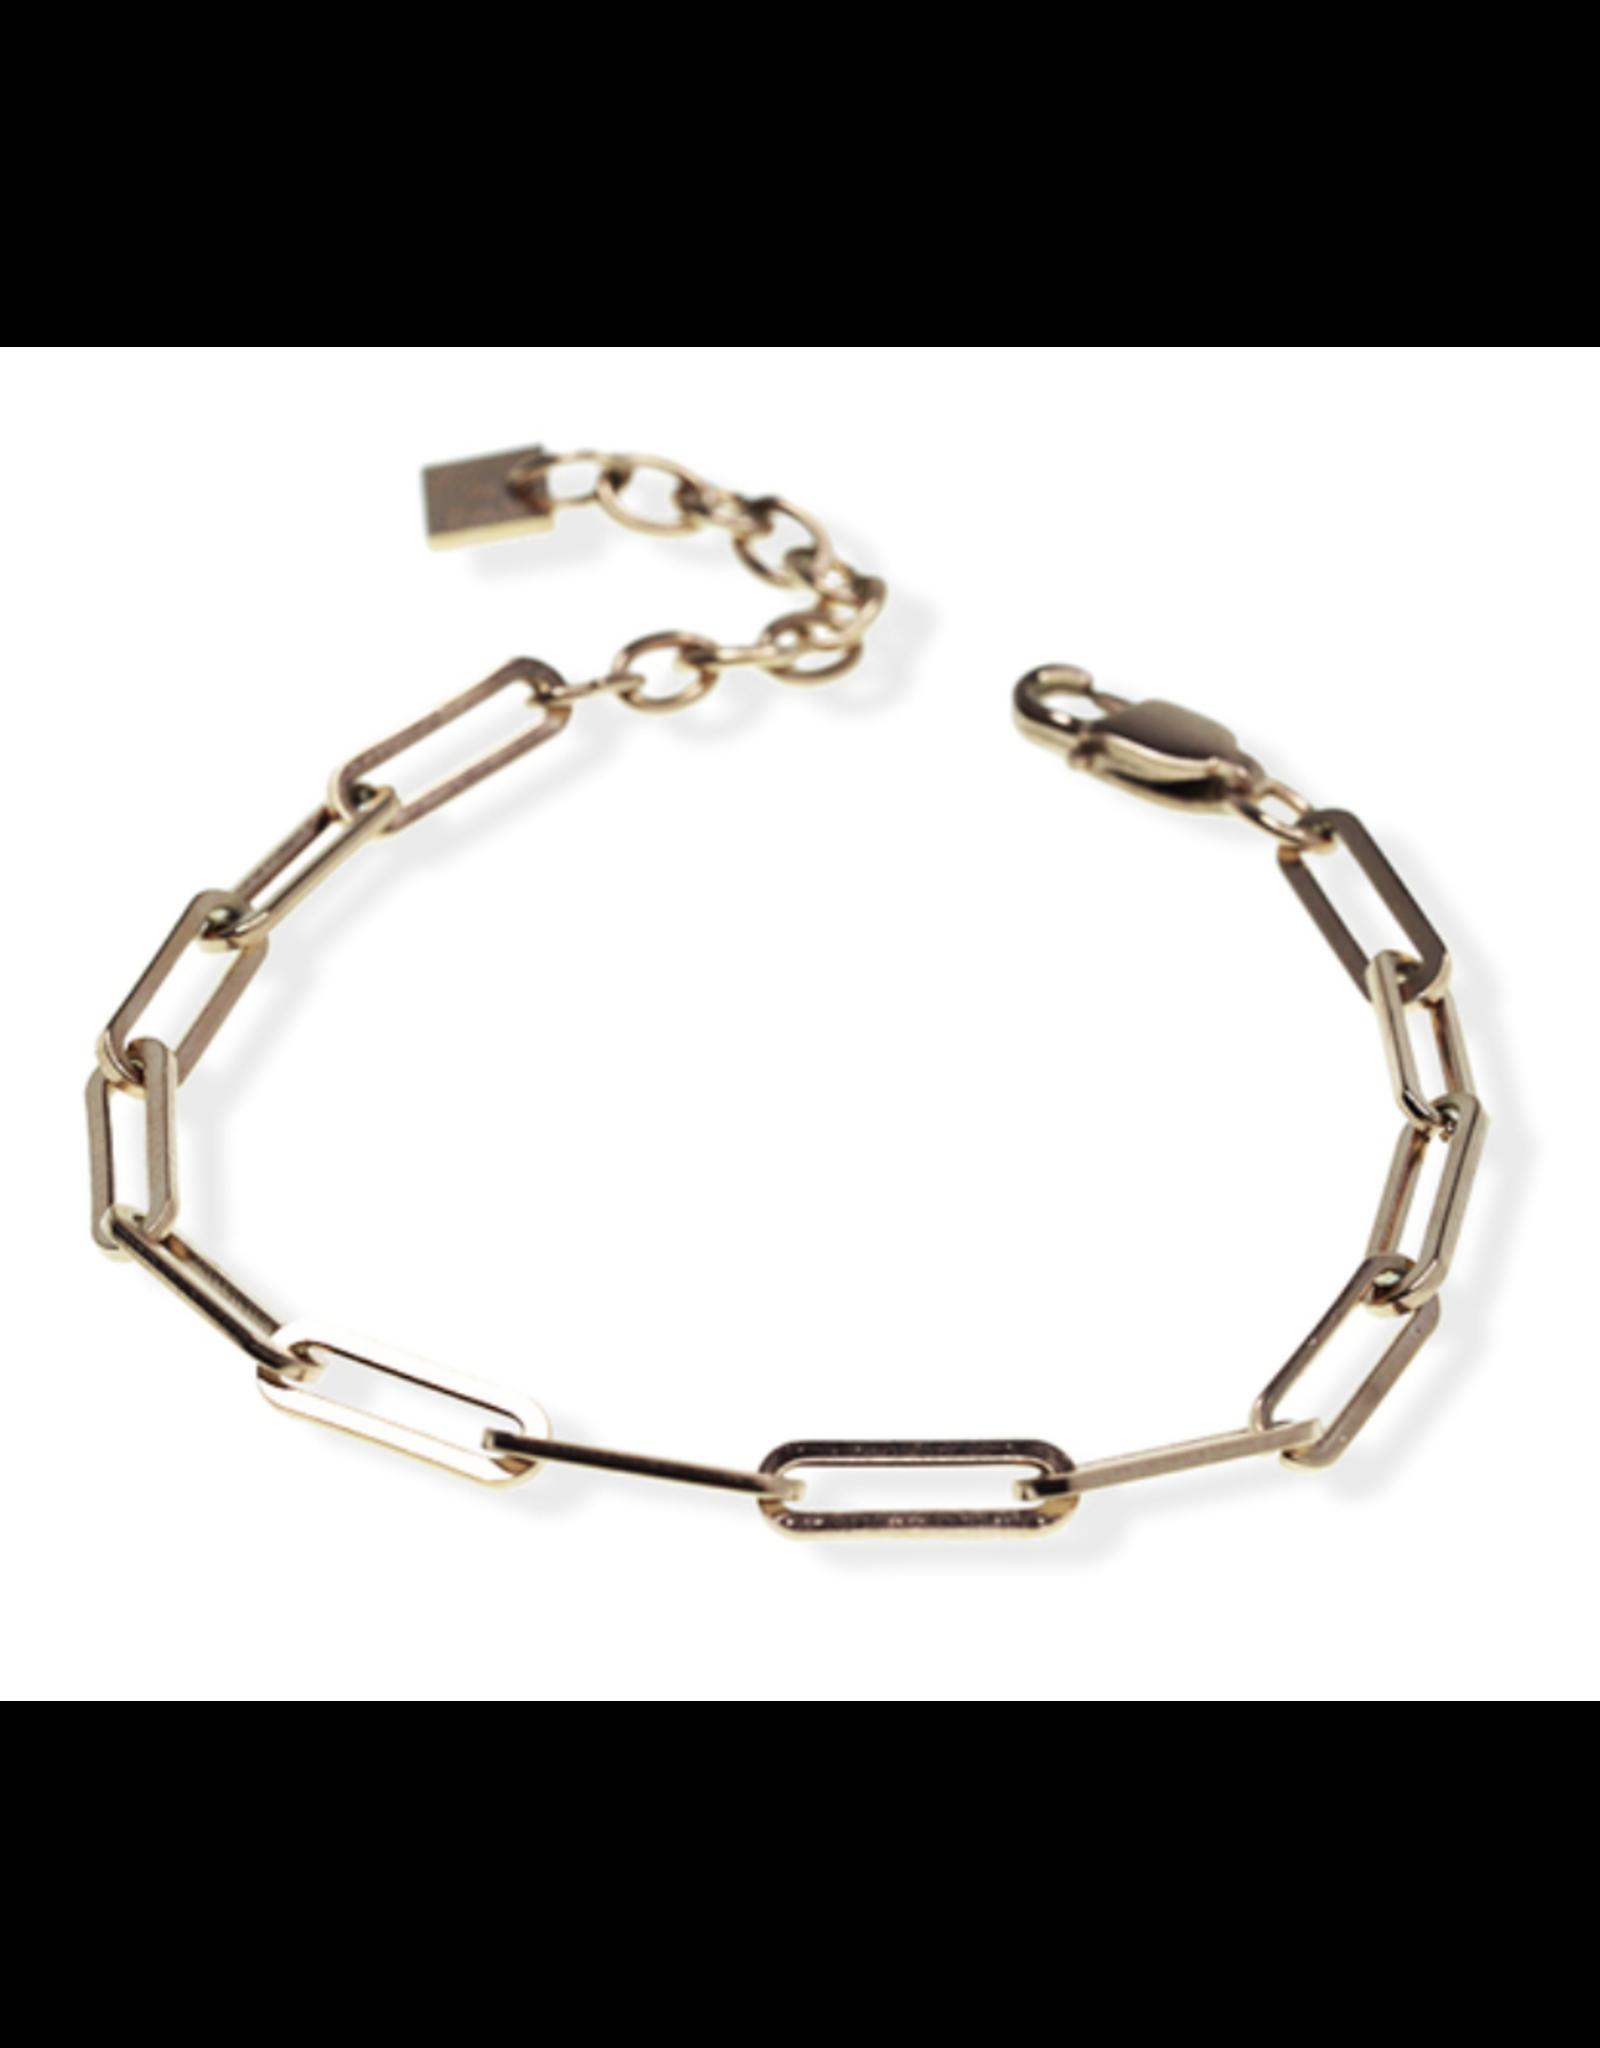 Blake Paperclip Bracelet - Gold